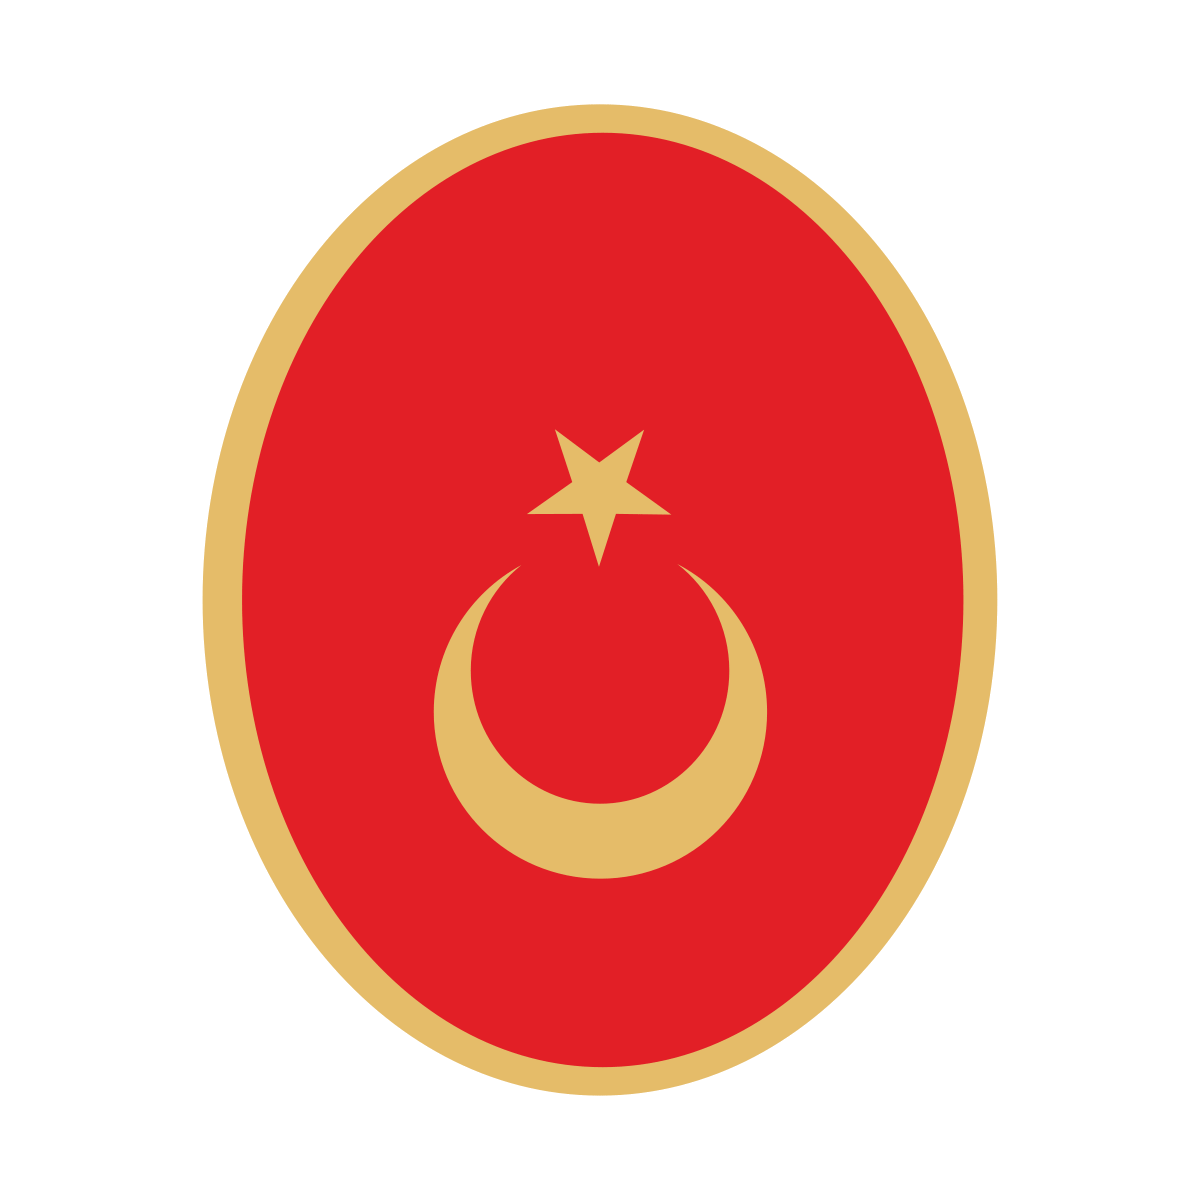 Ambasada Turcji